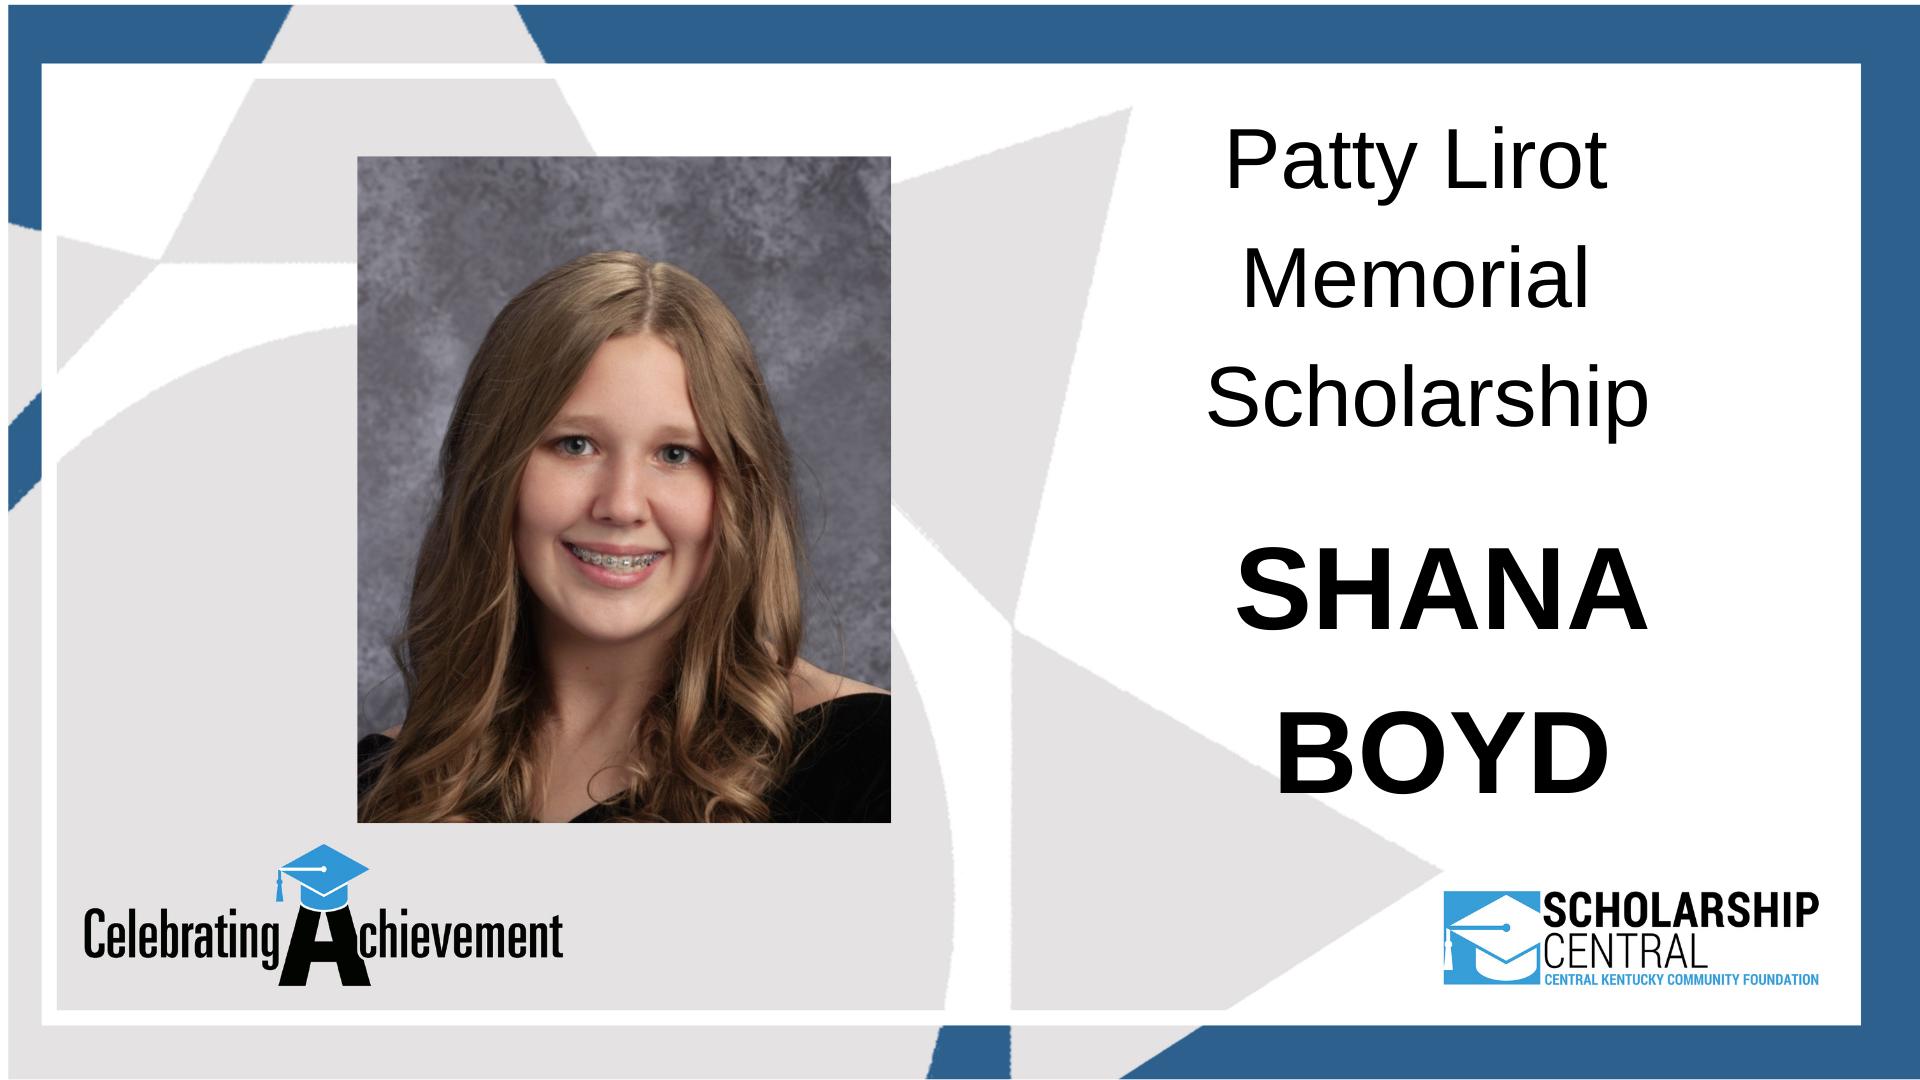 Patty Lirot Memorial Scholarship Winner